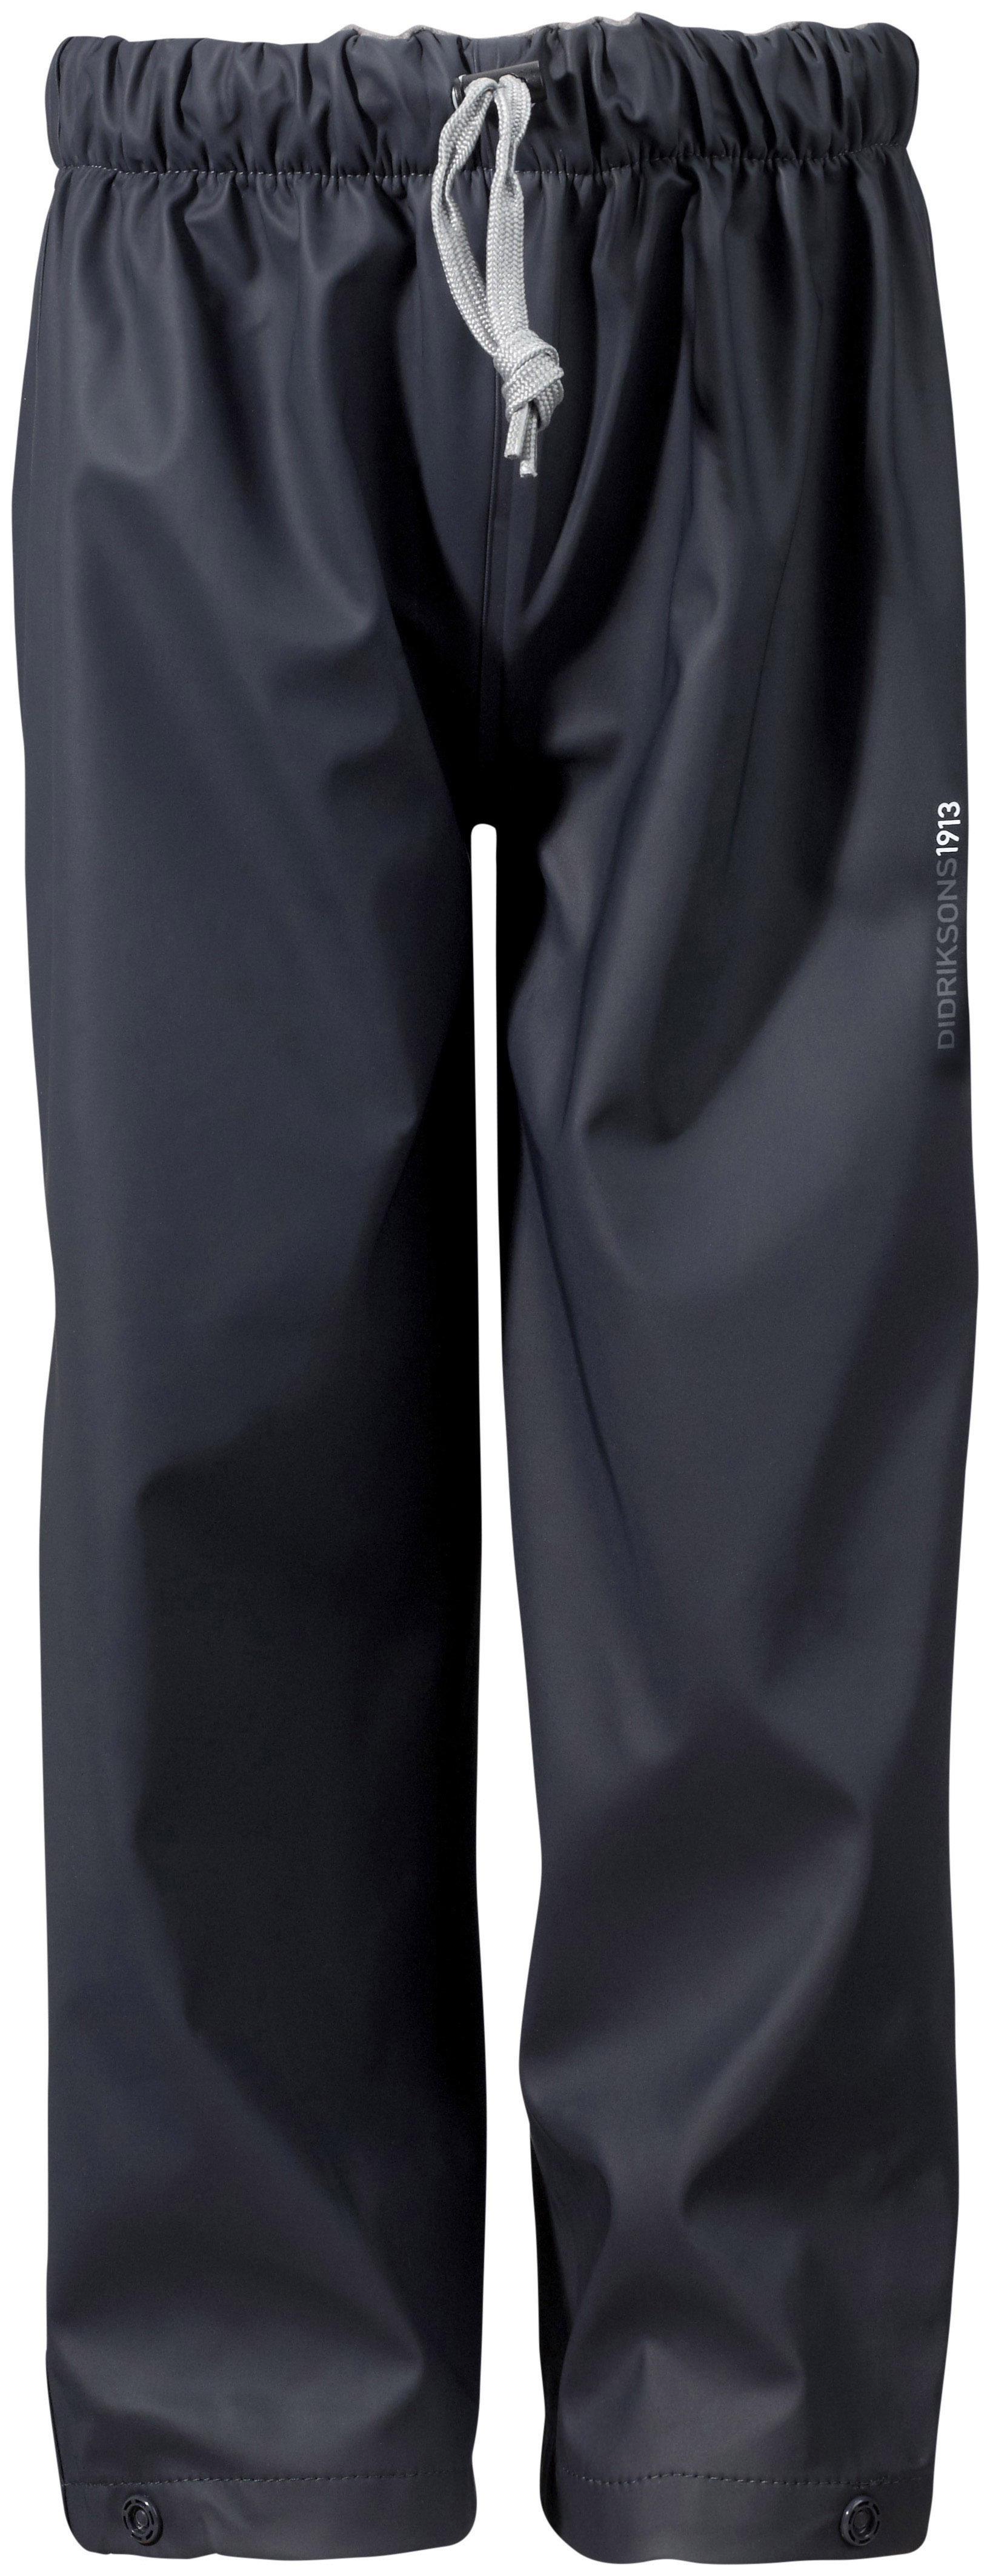 didriksons midjeman galon® regnbukse barn - navy